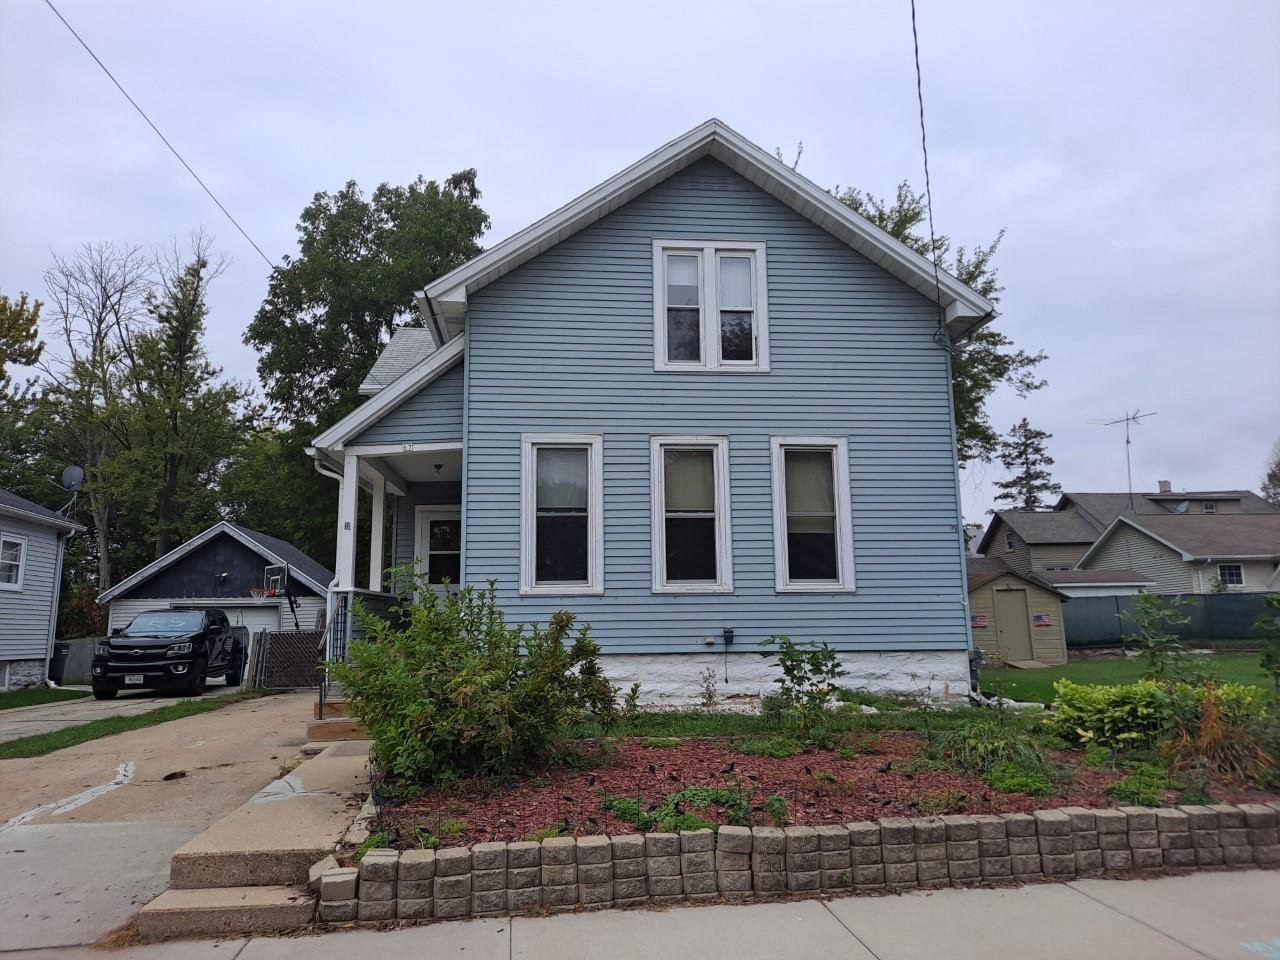 67 EVELINE Street, Oshkosh, WI 54901 - MLS#: 50249674